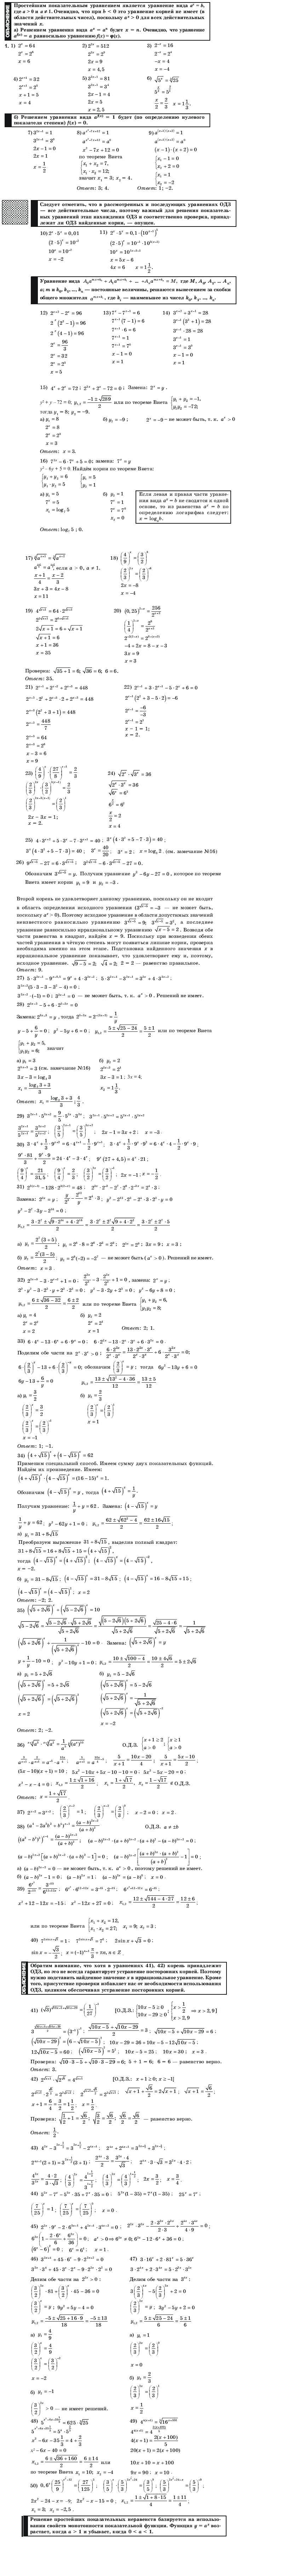 10 дубинчук шкіль гдз слєпкань математика клас